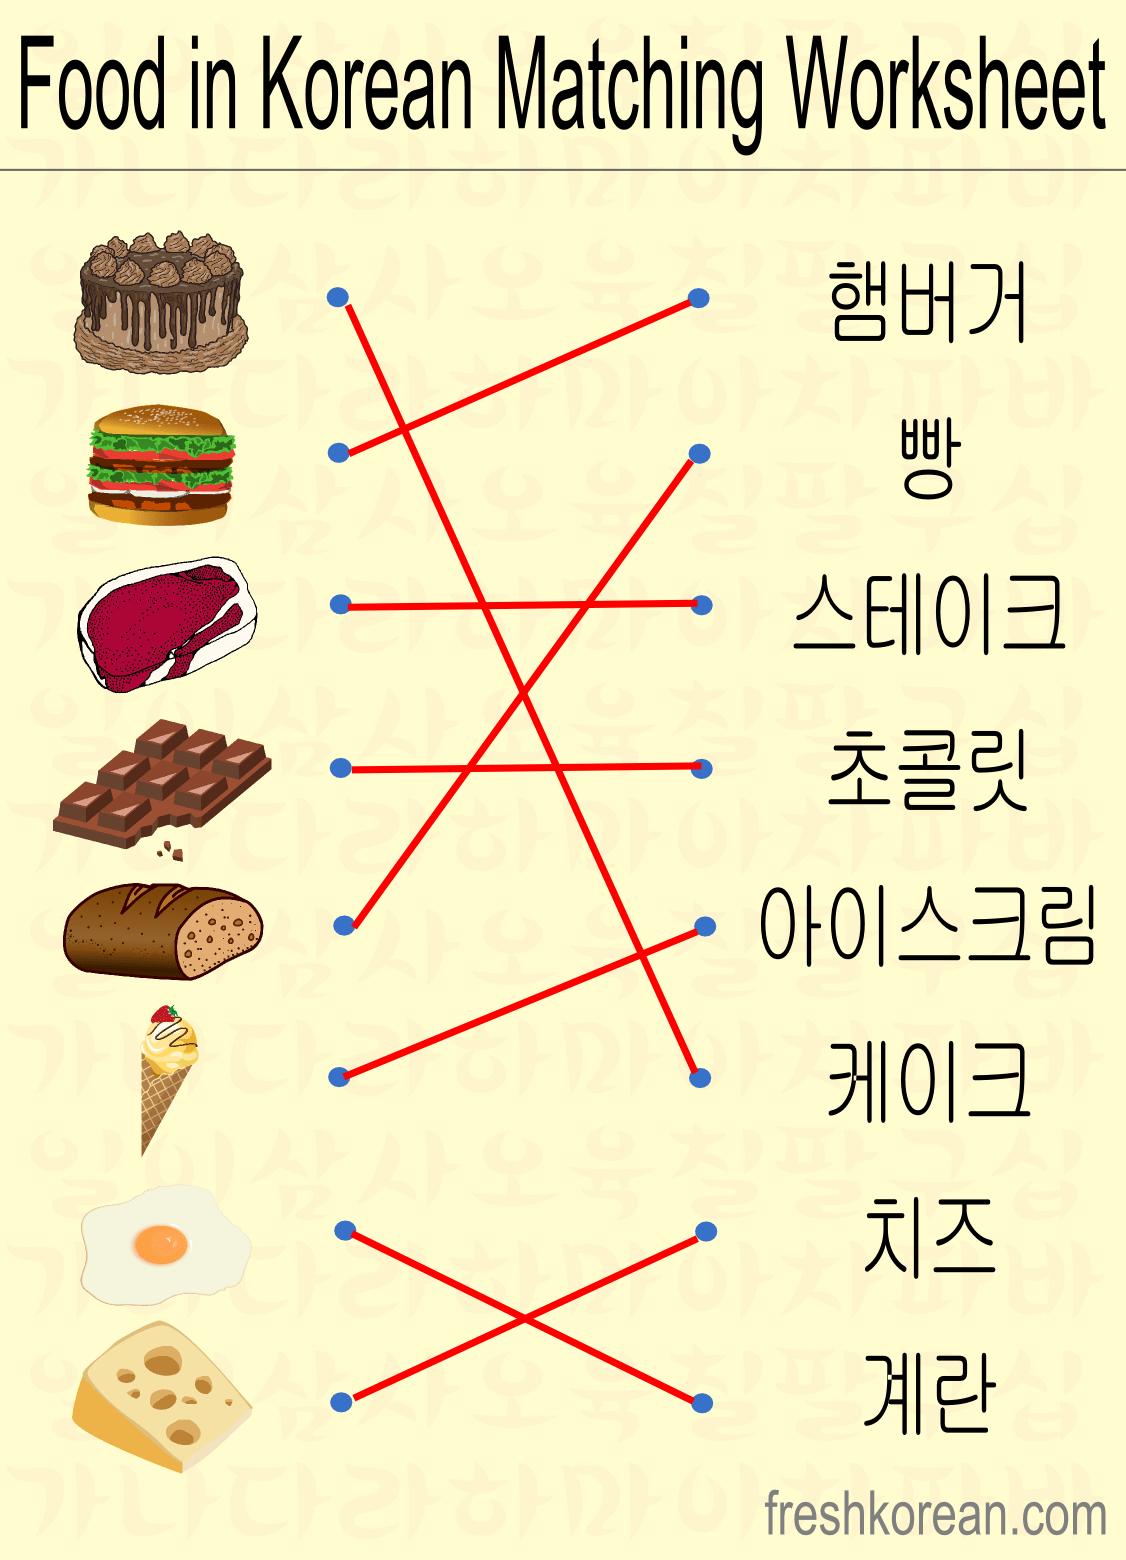 Food In Korean Worksheet Series Part 2 Matching Fresh